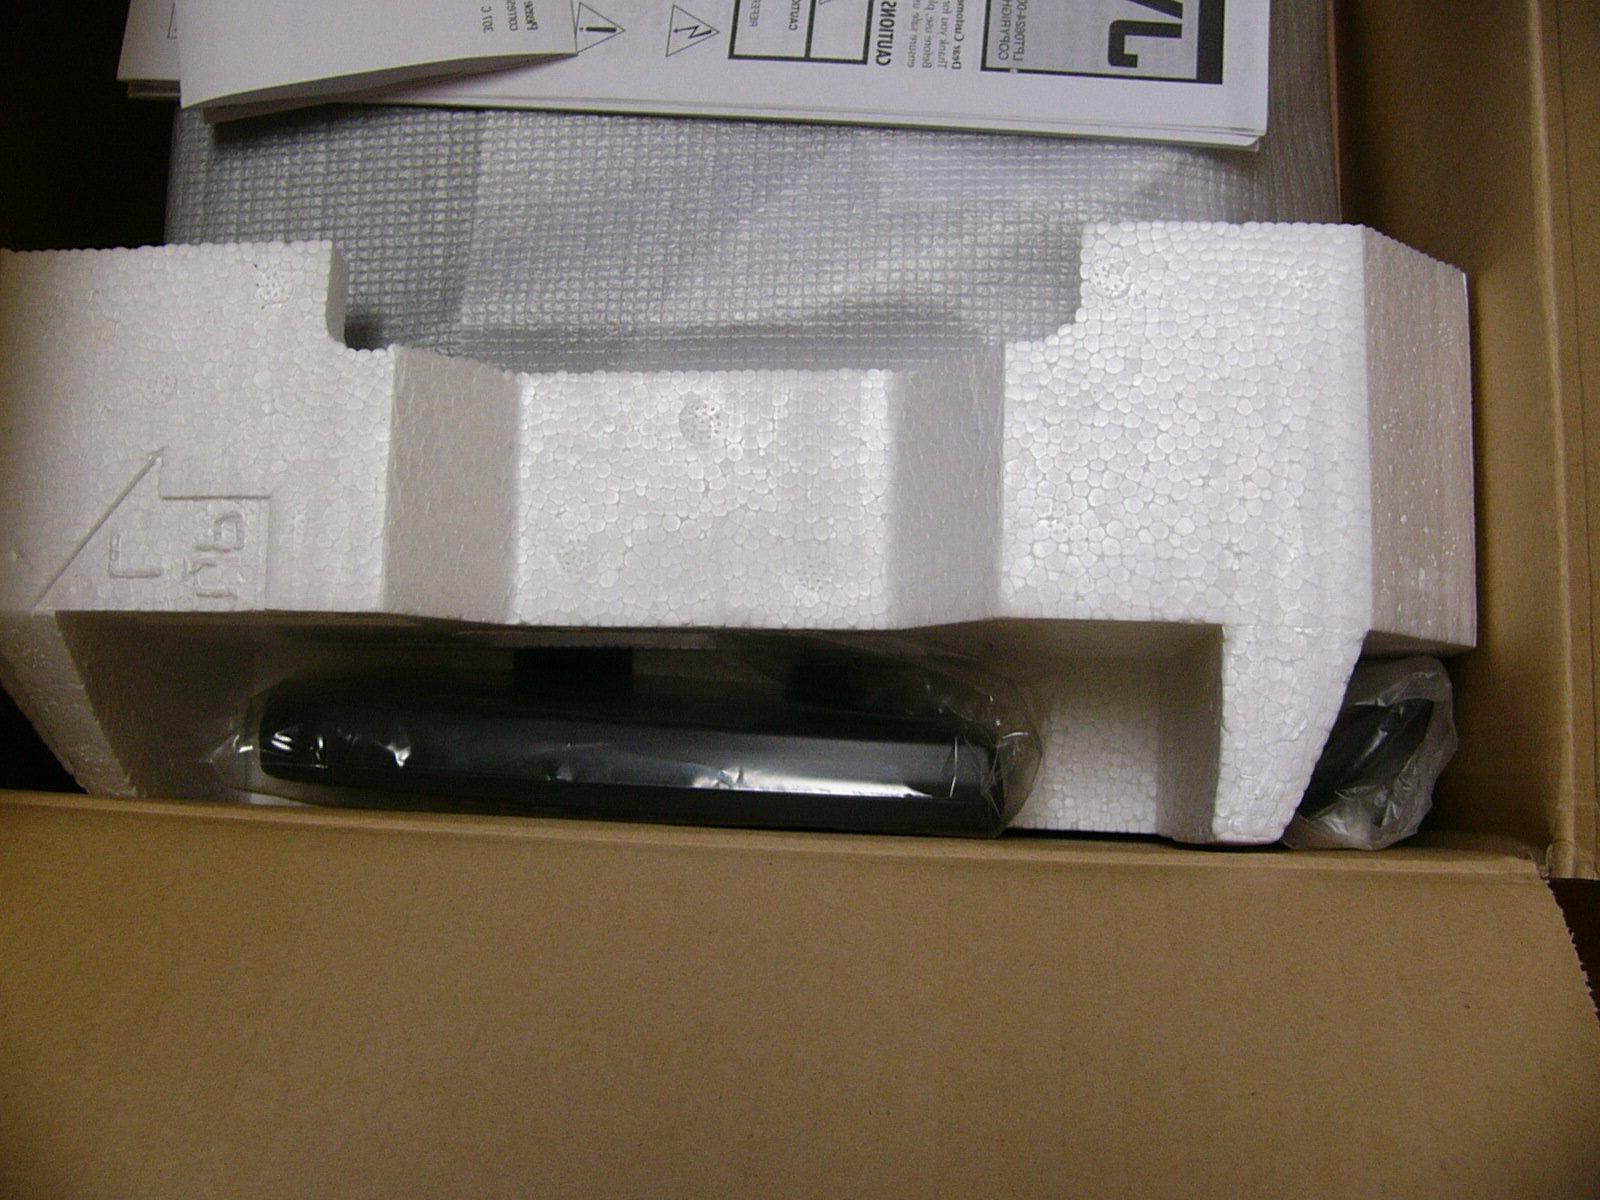 NEW JVC HR-J691U S-VHS Player 4 Fi Stereo Video Cassette Recorder